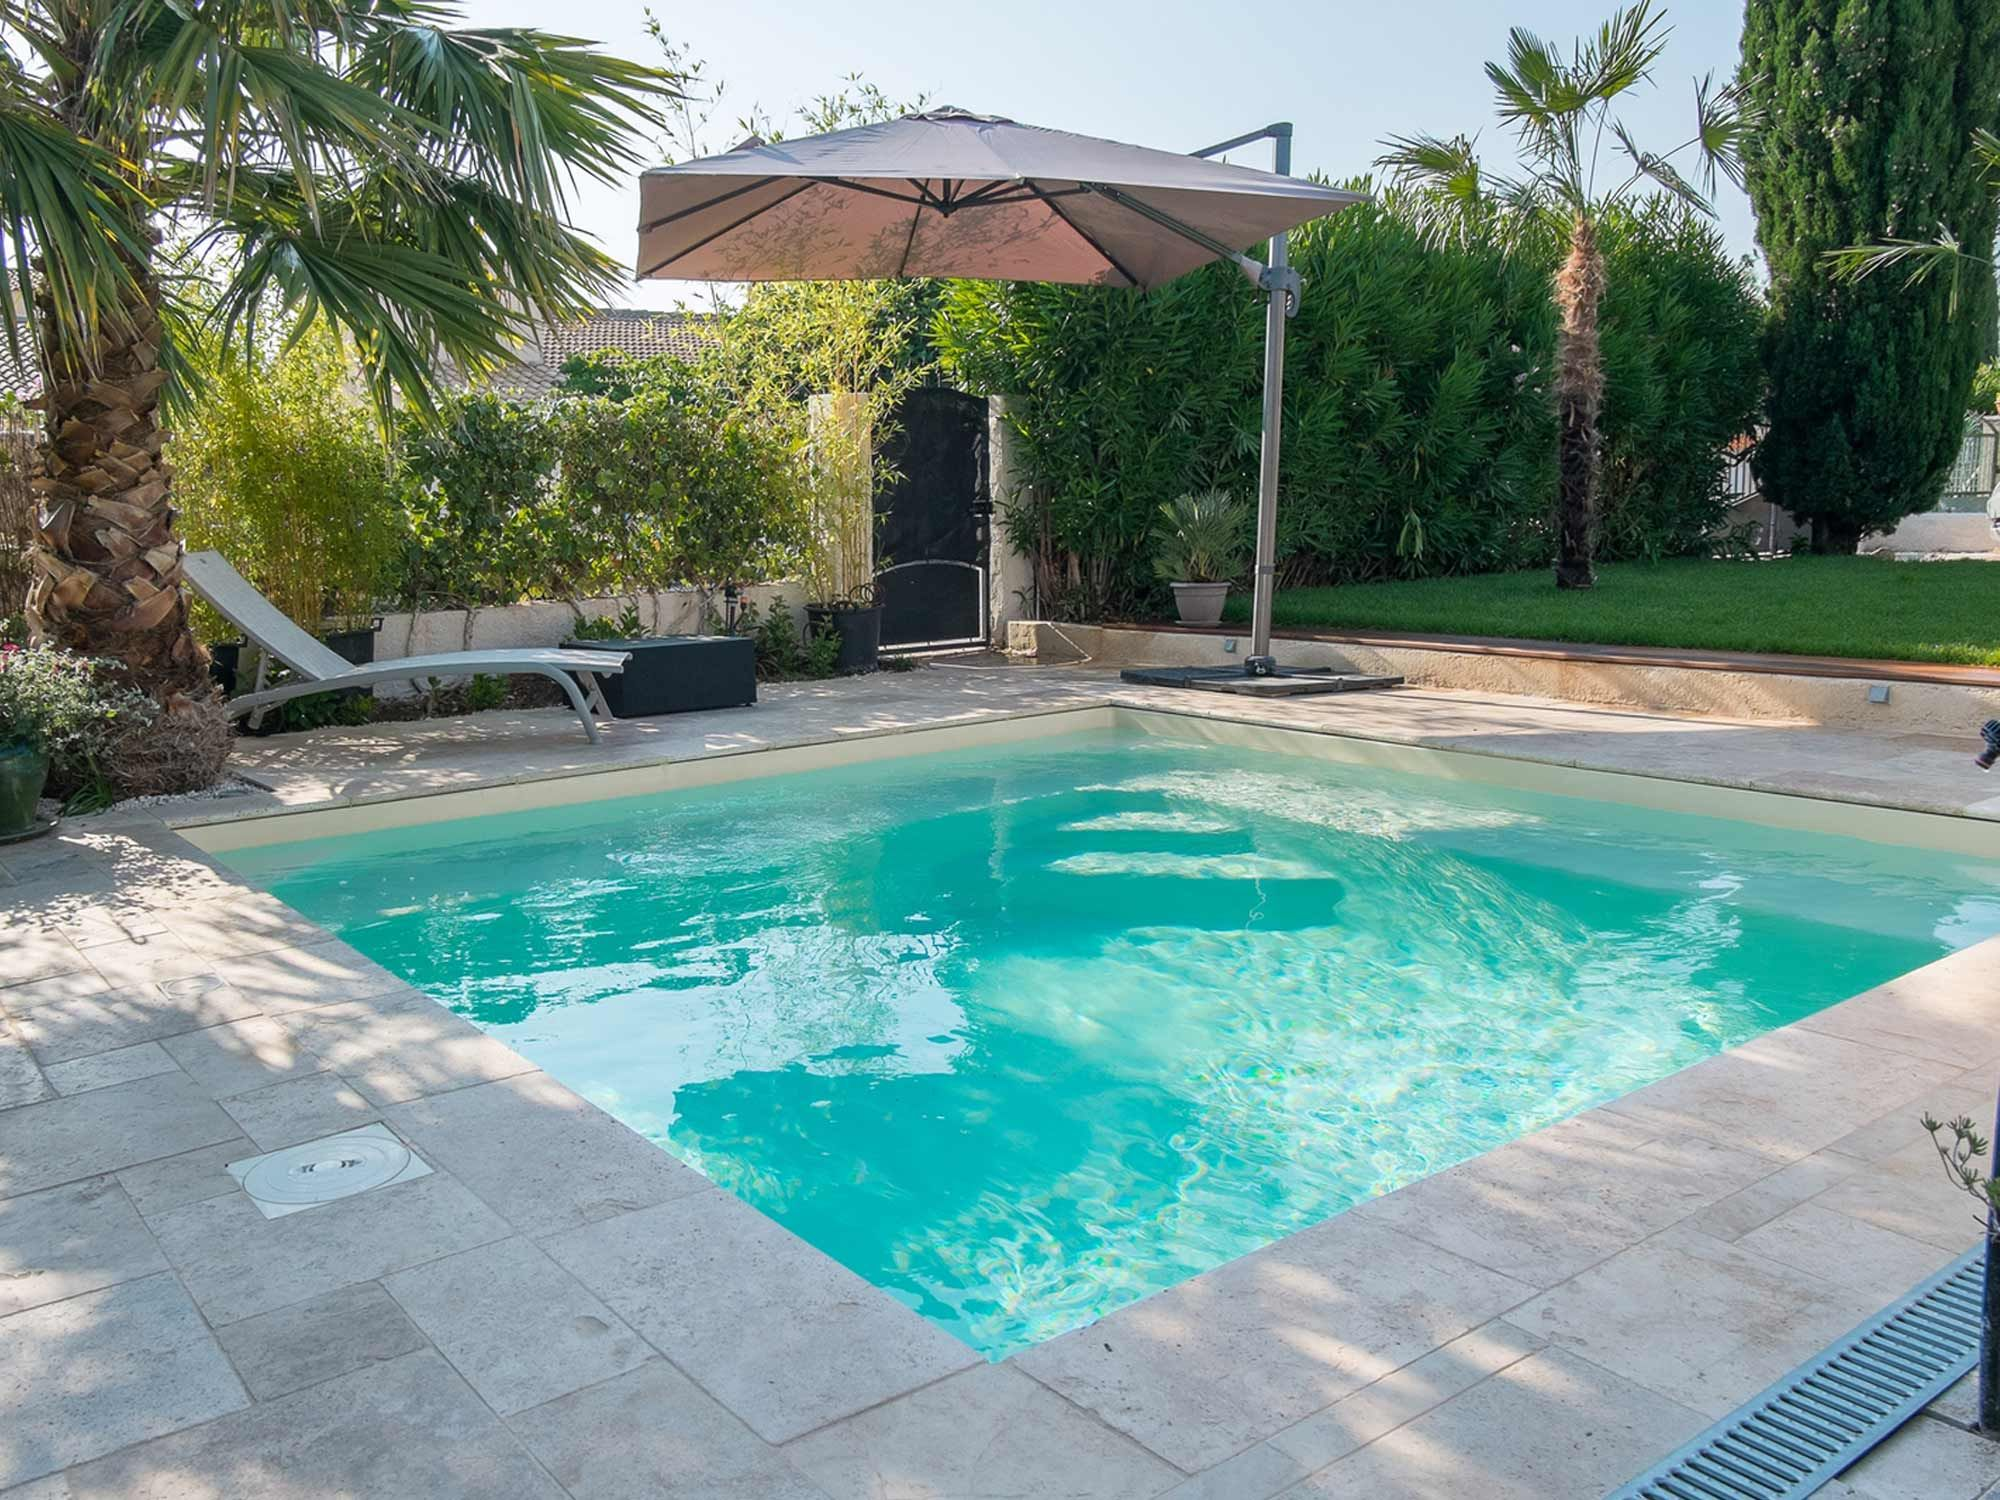 coque piscine 6 x 4